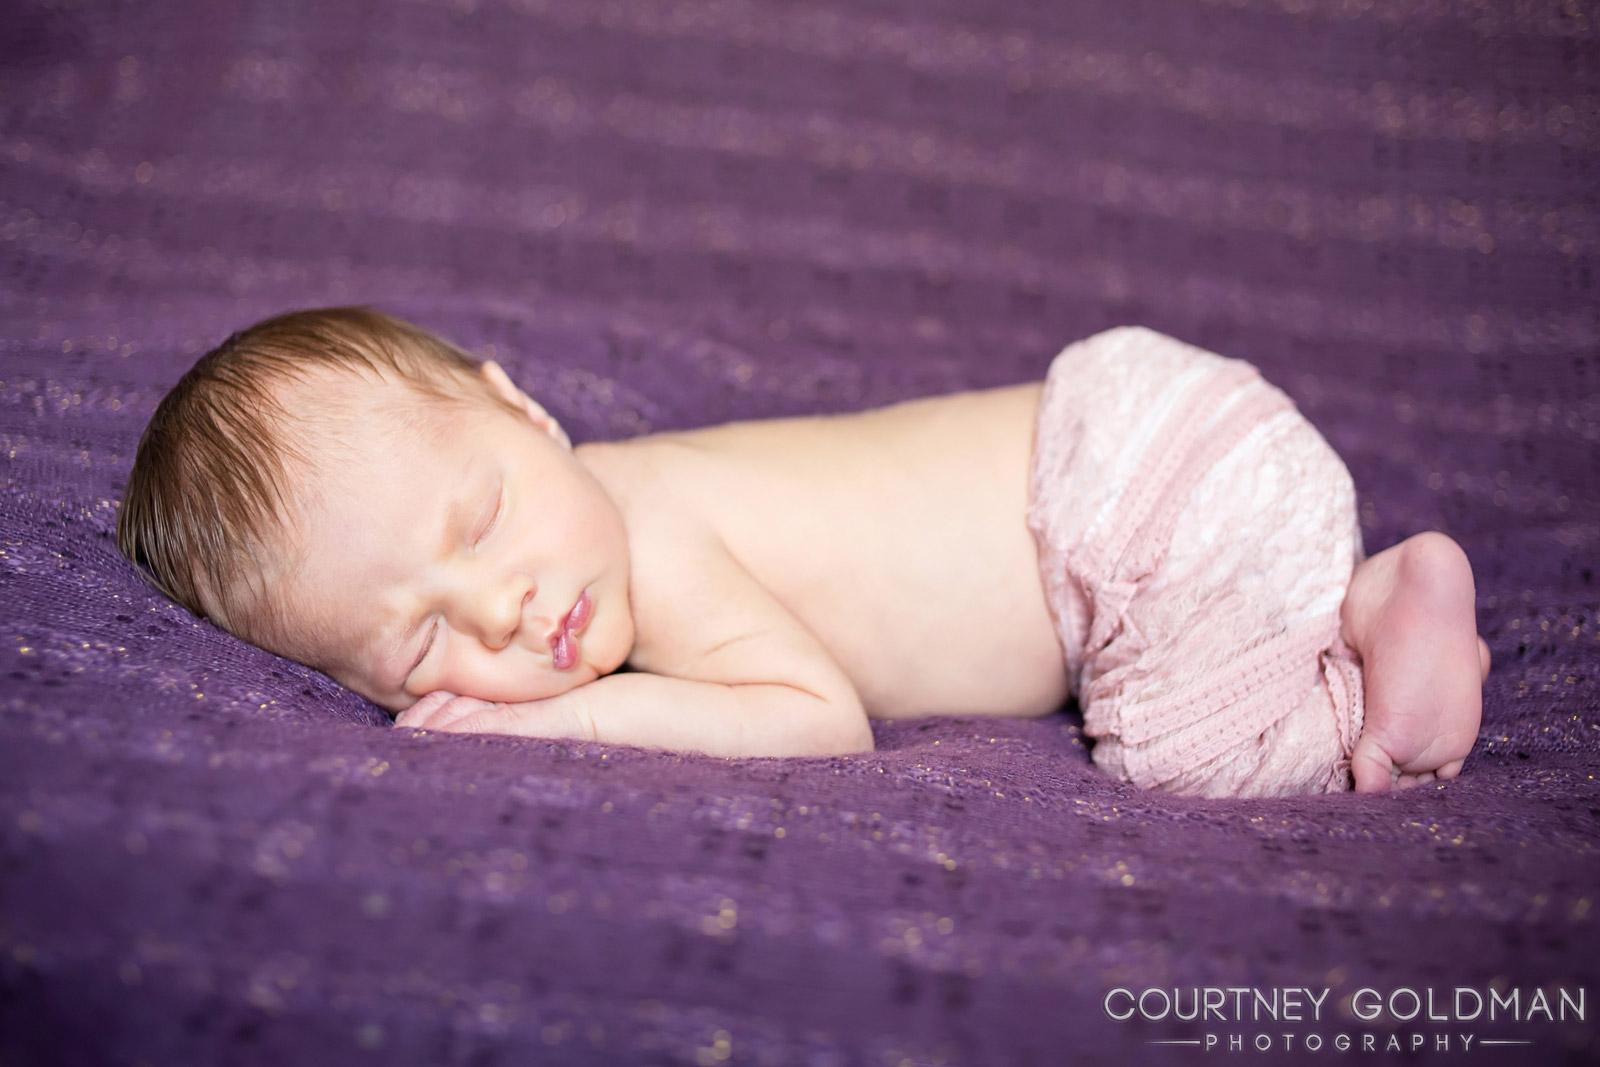 Atlanta Maternity and Newborn Photography by Courtney Goldman 13.jpg